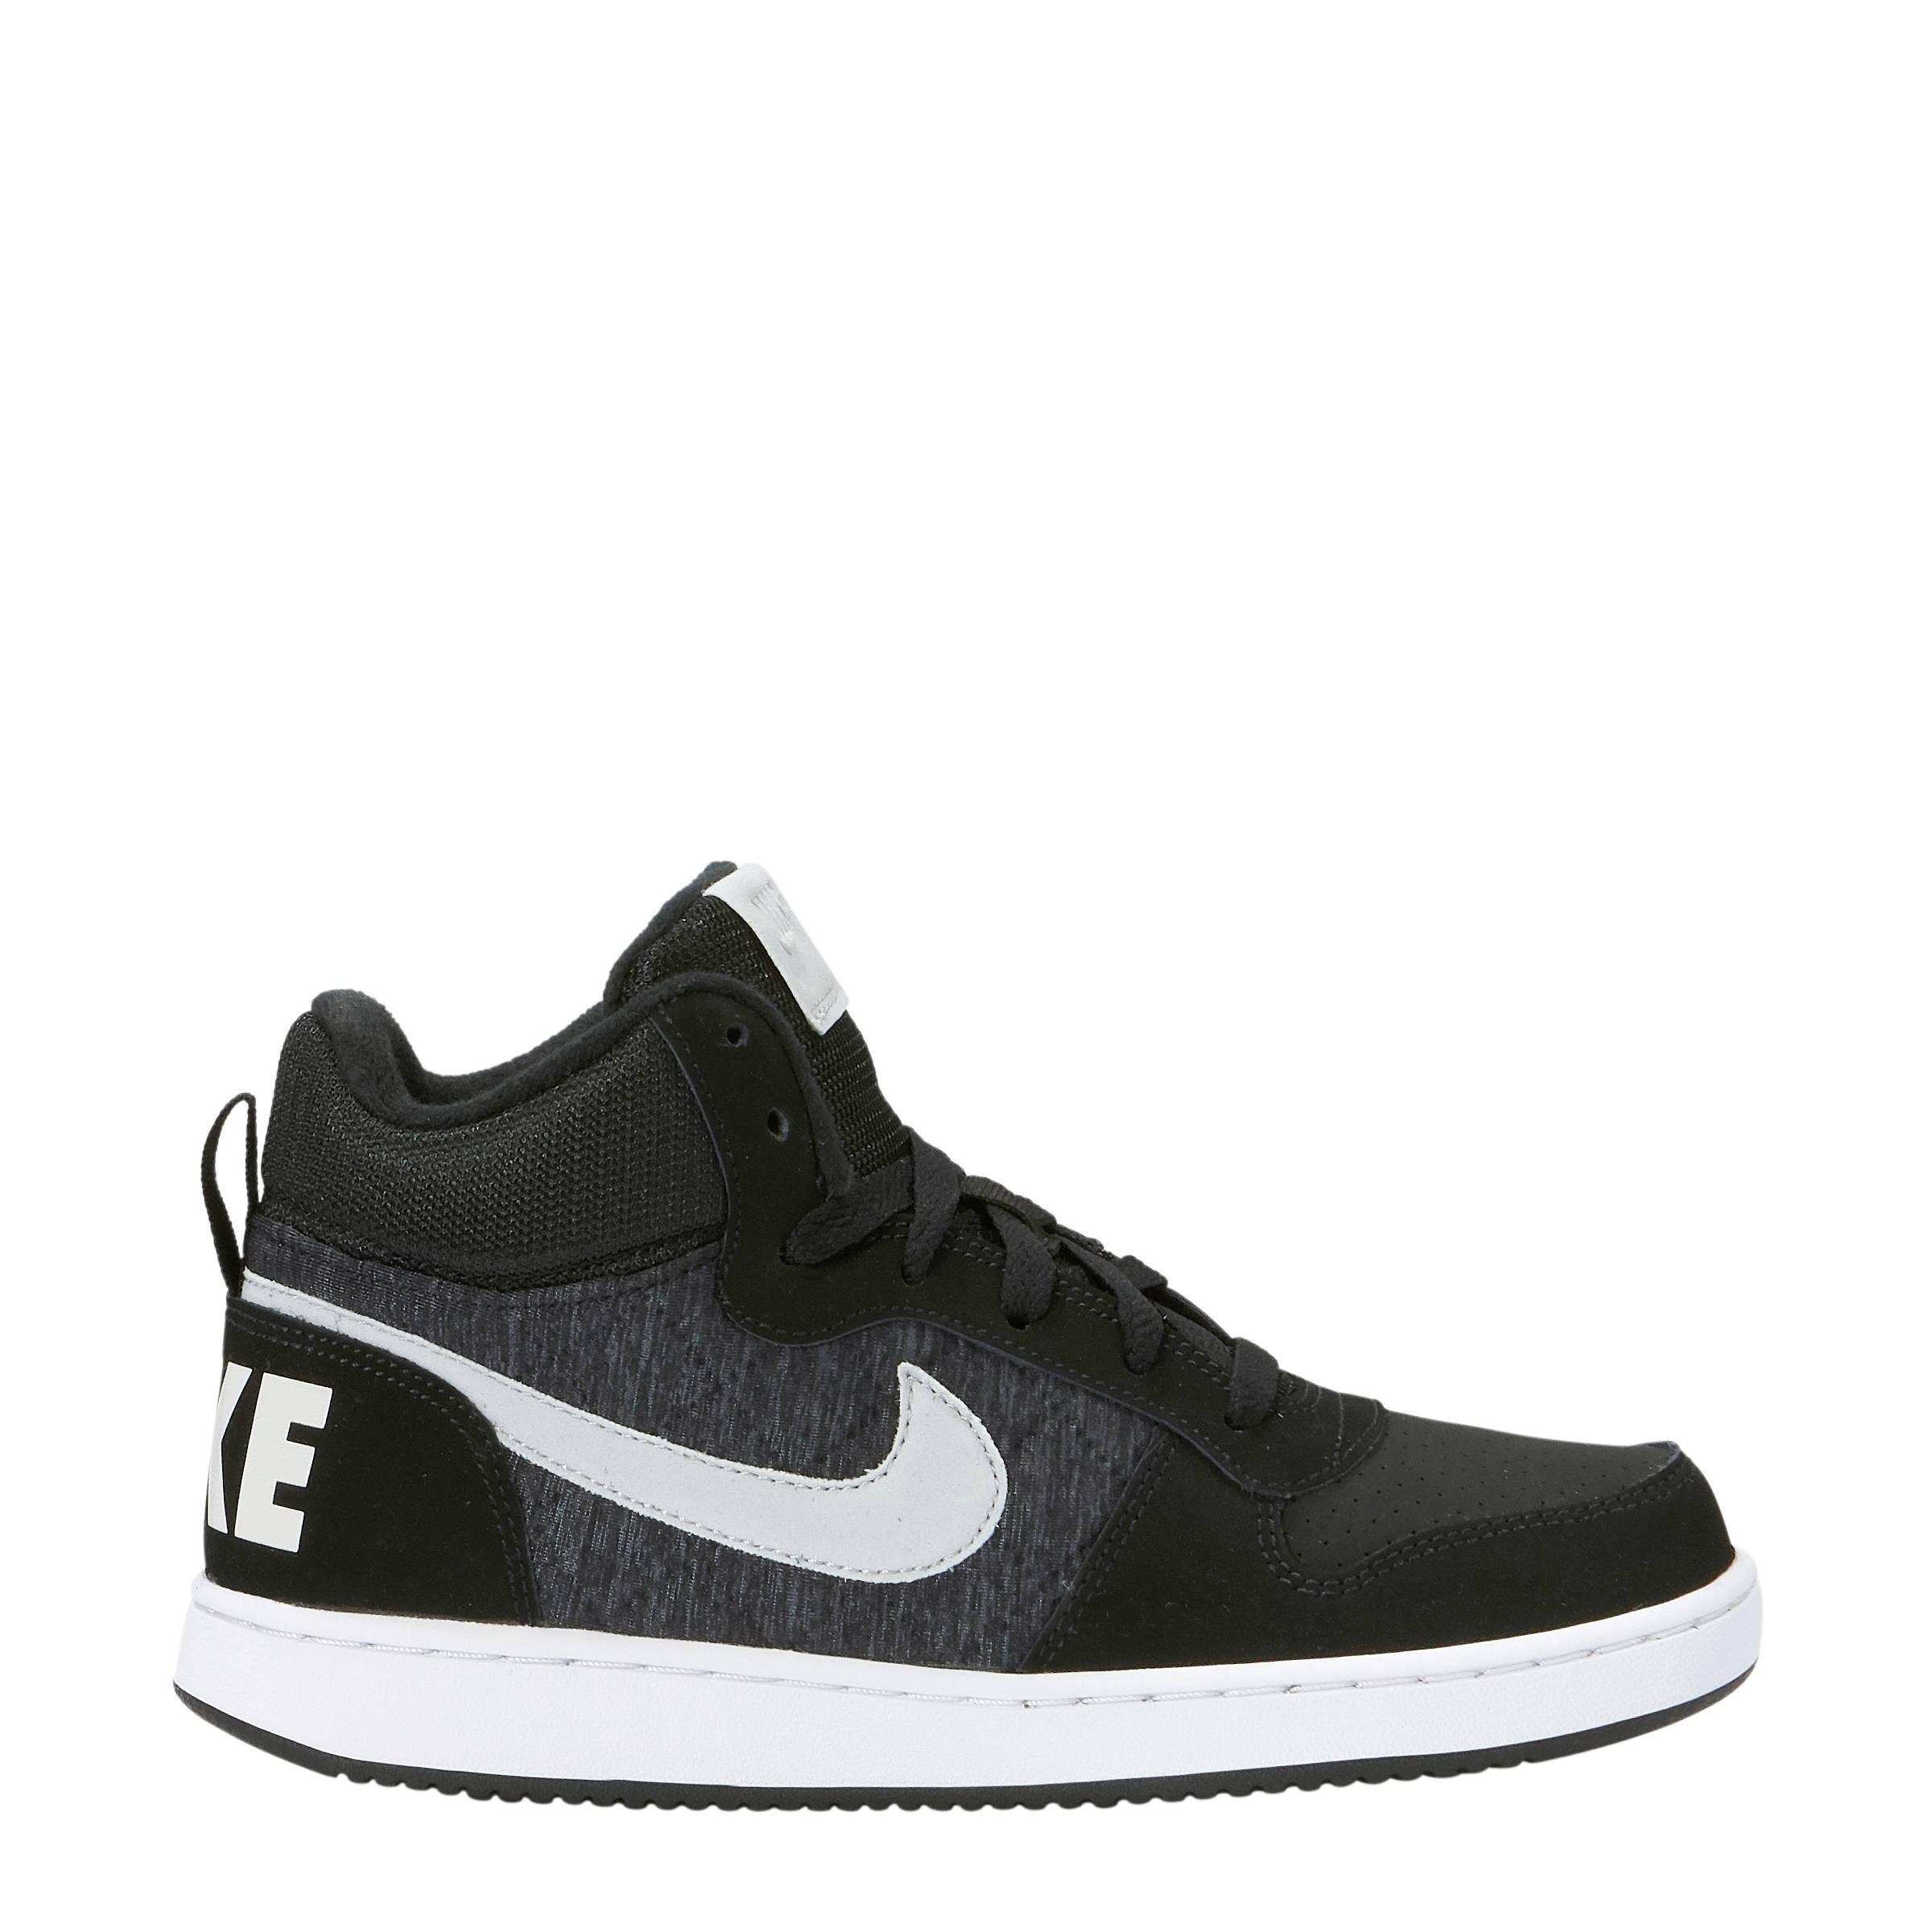 59088d22b75 Nike Court Borough Mid SE sneakers | wehkamp